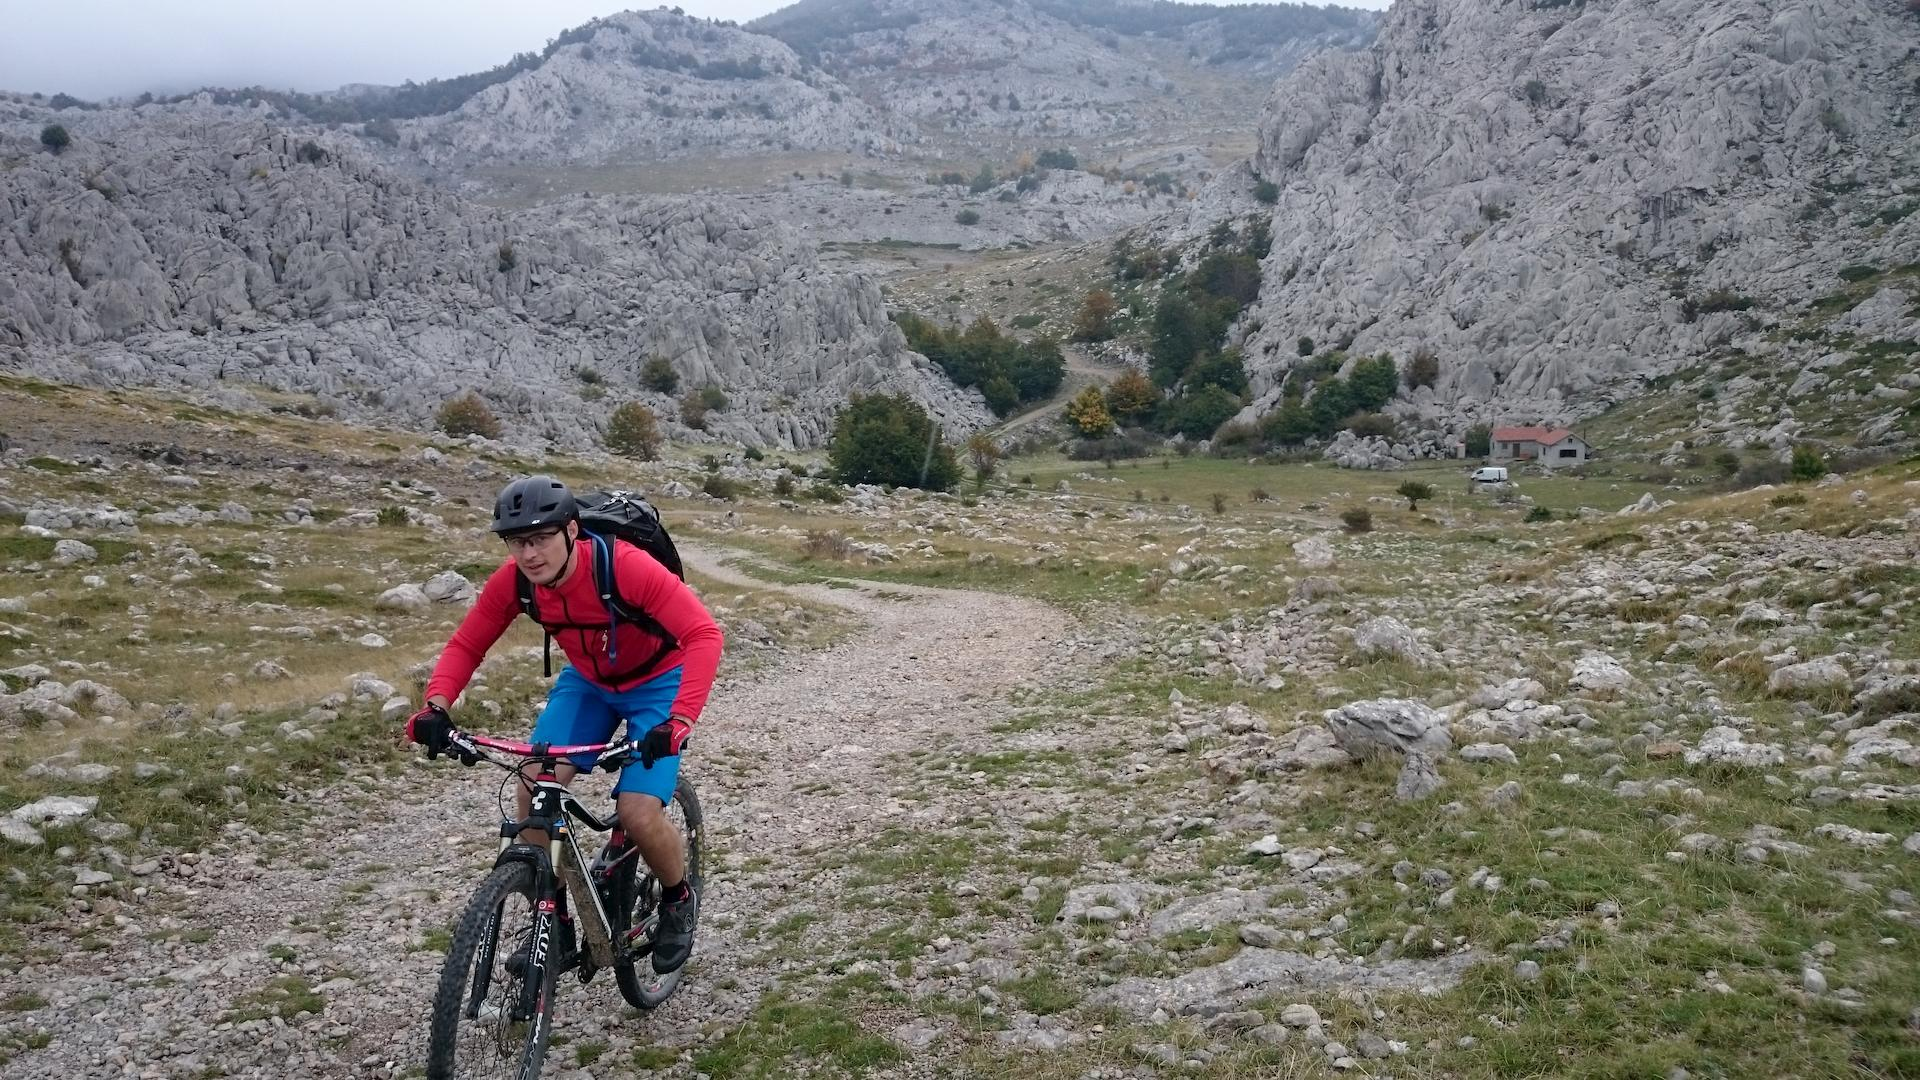 Gravel road, bike tour